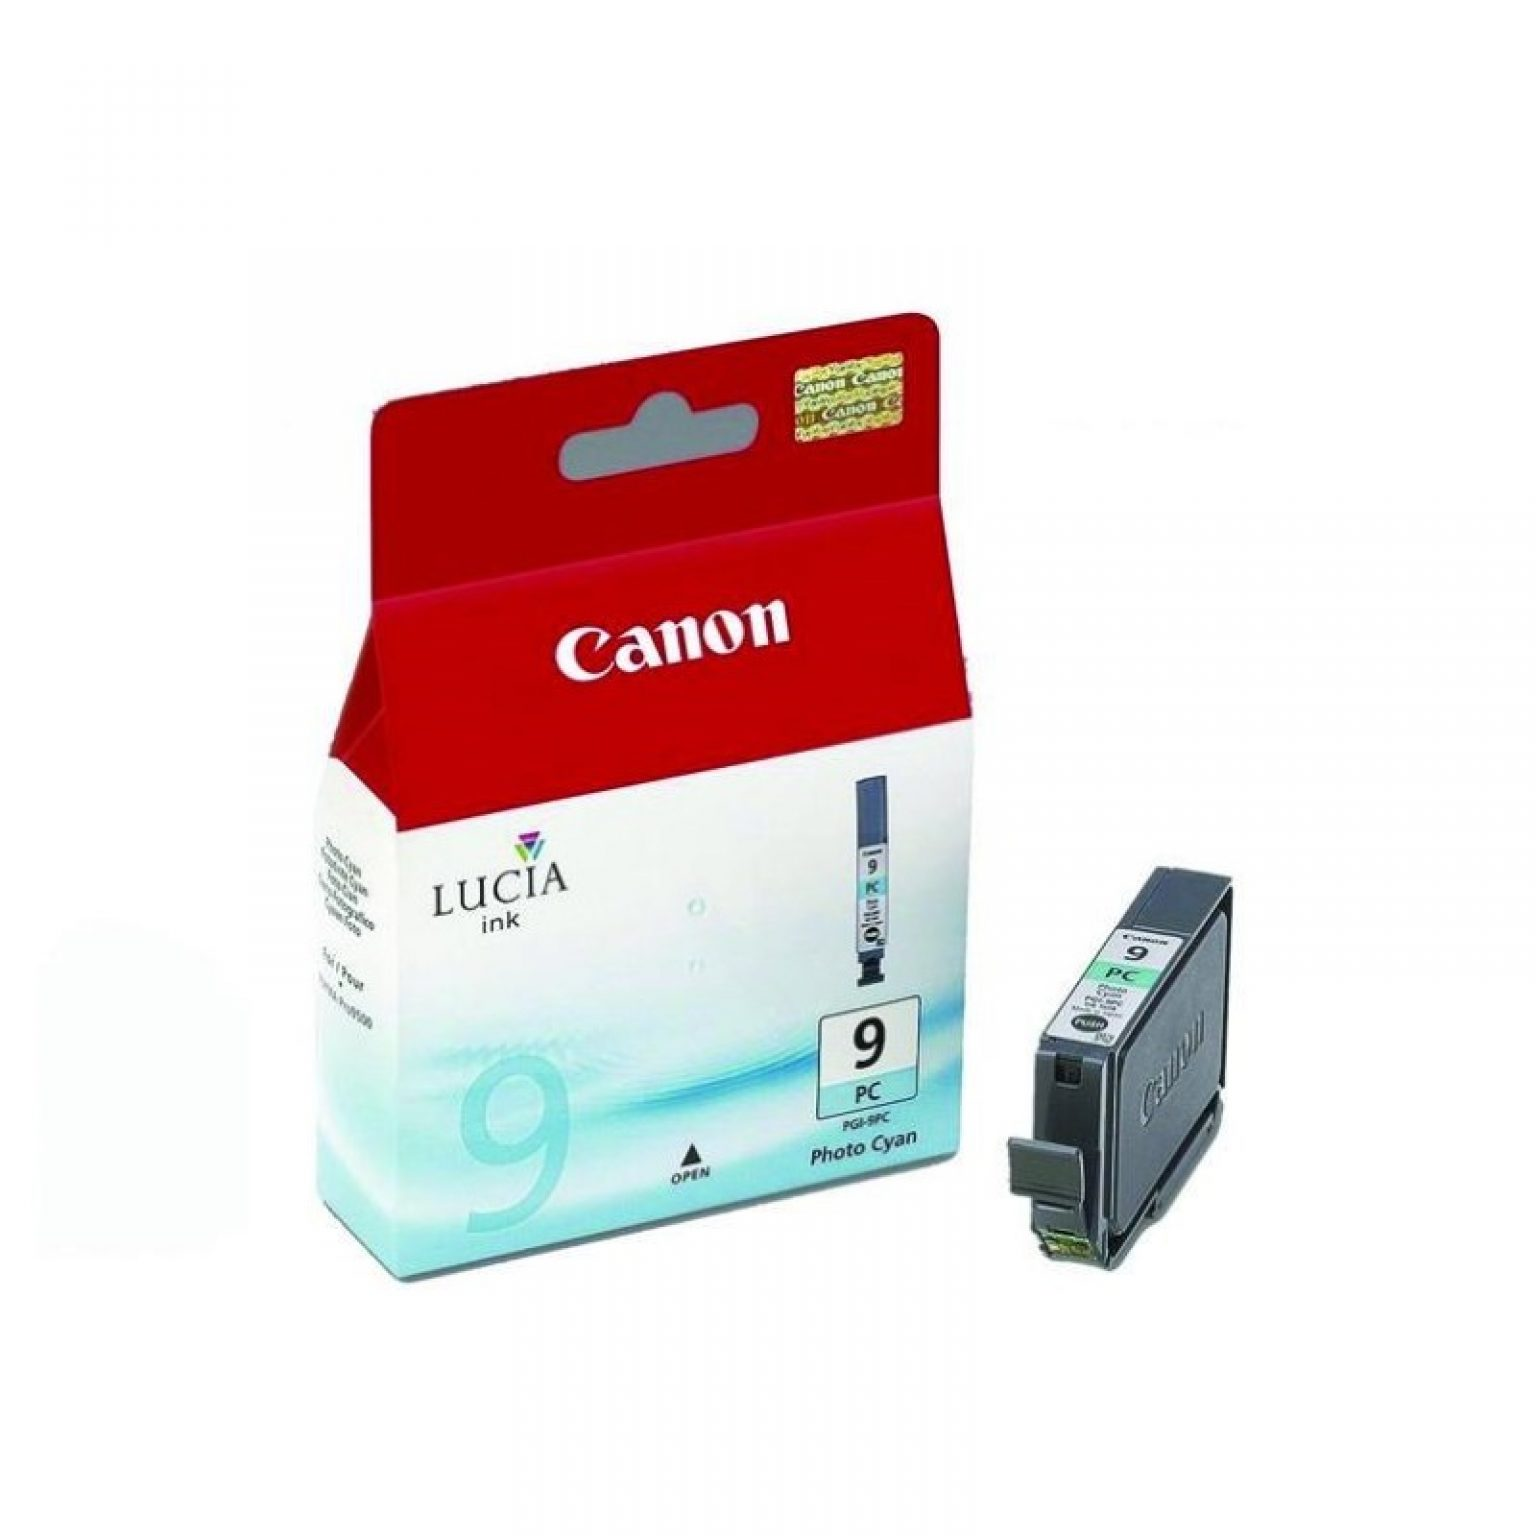 CANON - Ink Cartridge PGI-9 Photo Cyan (LUCIA INK) [PGI-9 PC]